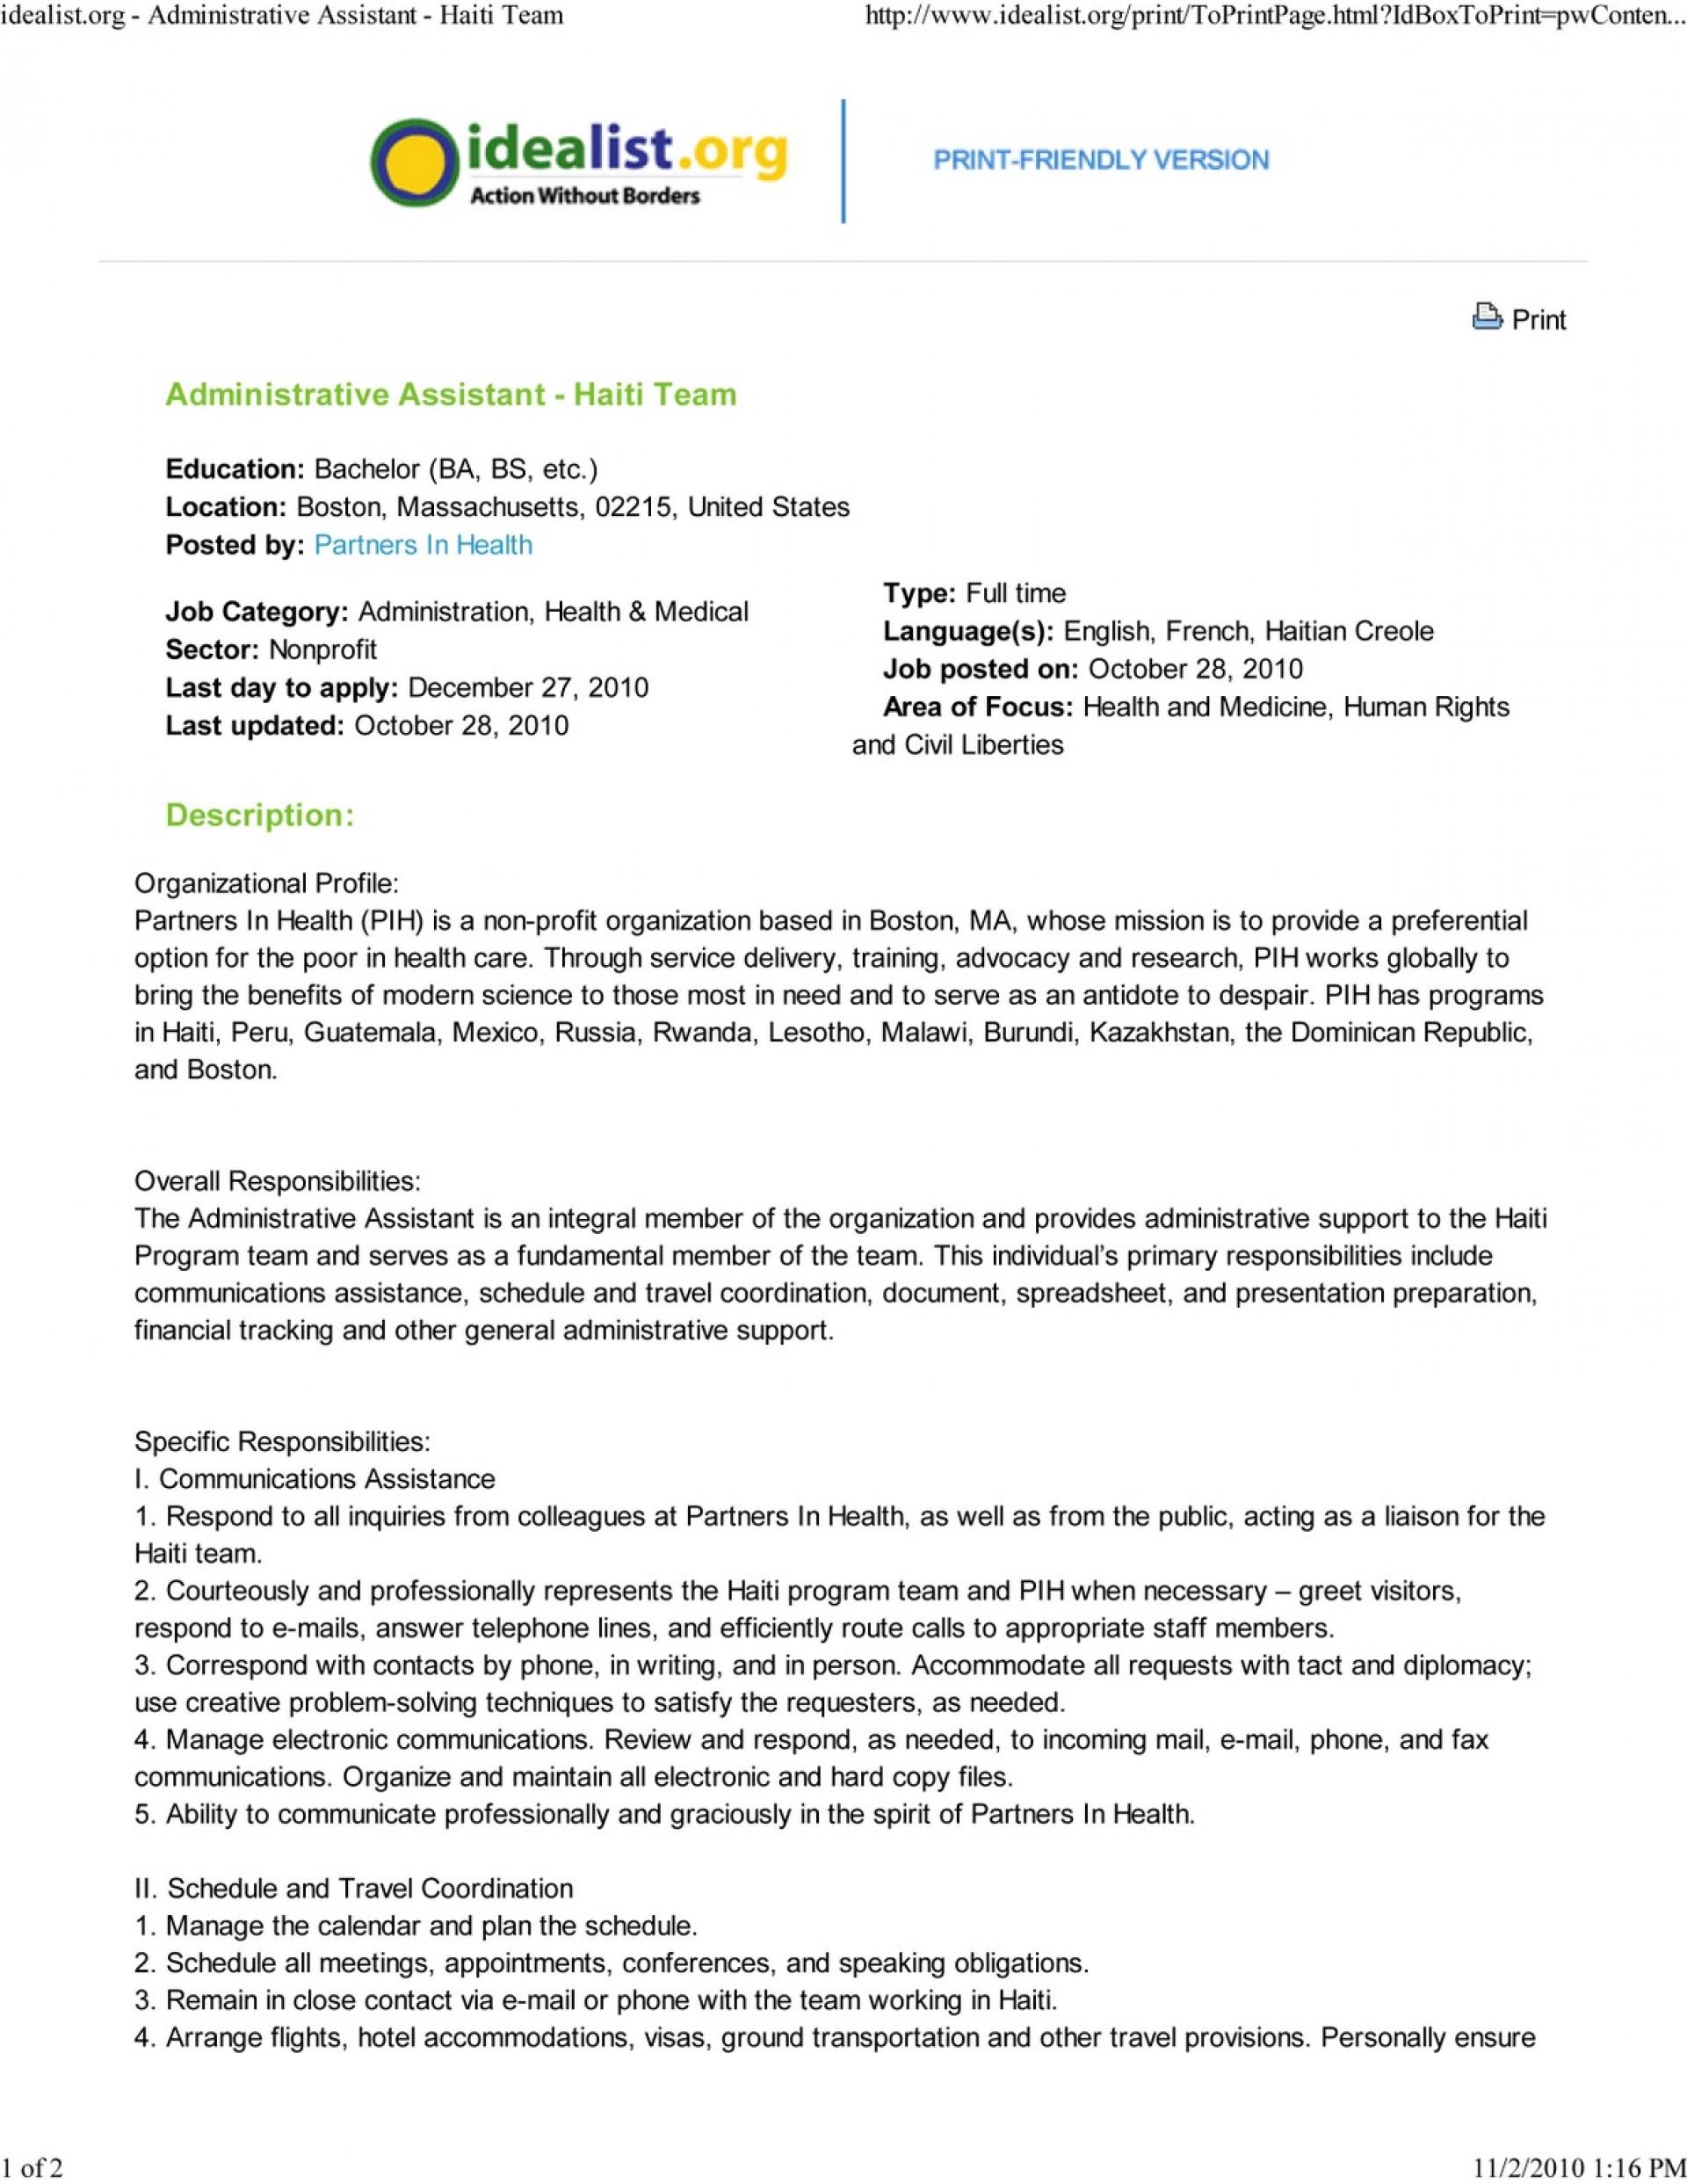 016 Admin2bassistant Essay Example Virginia Tech Phenomenal Essays Reddit Prompts 2018 Sat Requirements 1920